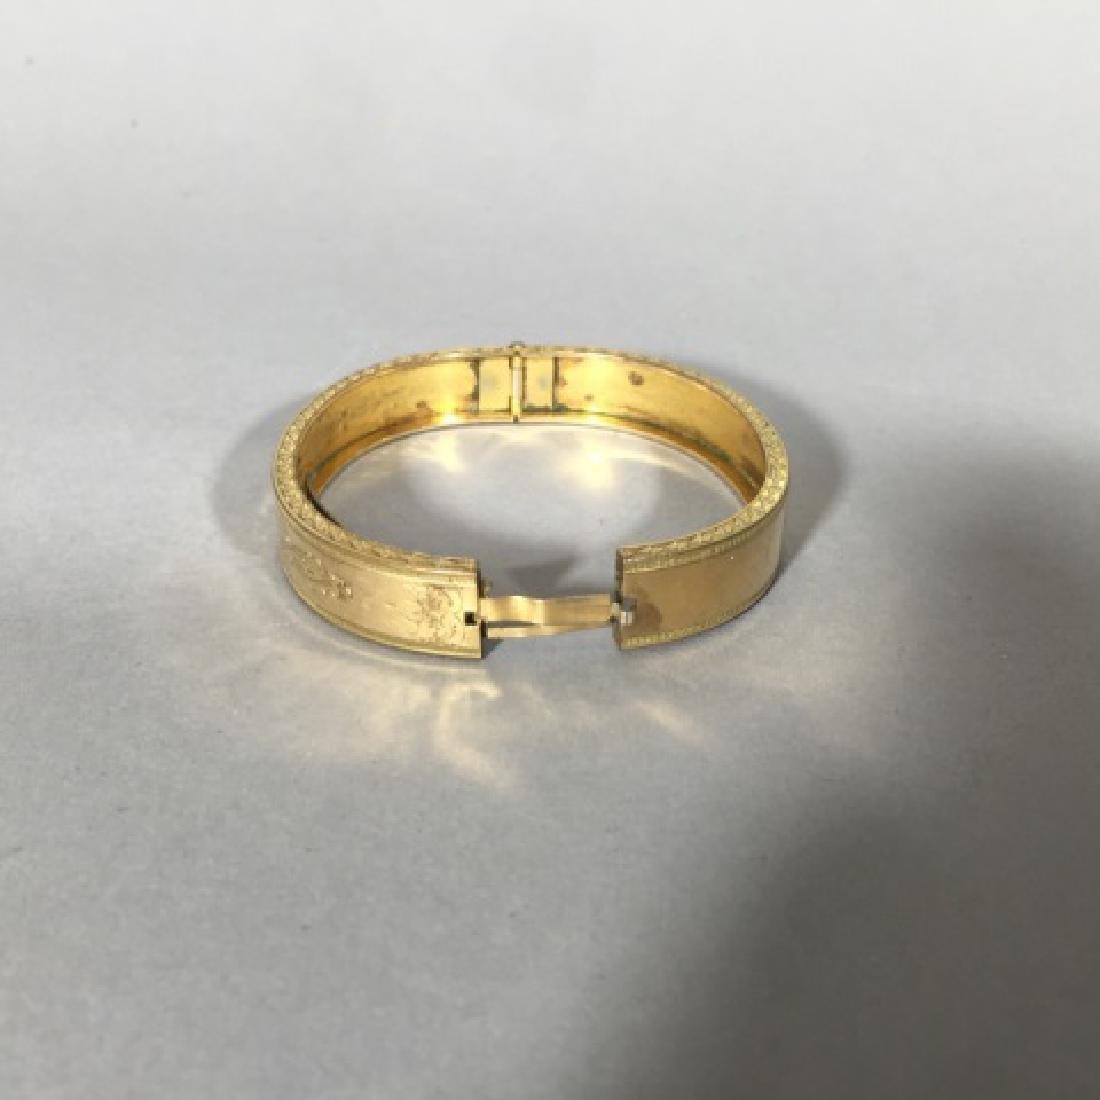 Antique 19th C Victorian Gold Bangle Bracelet - 2